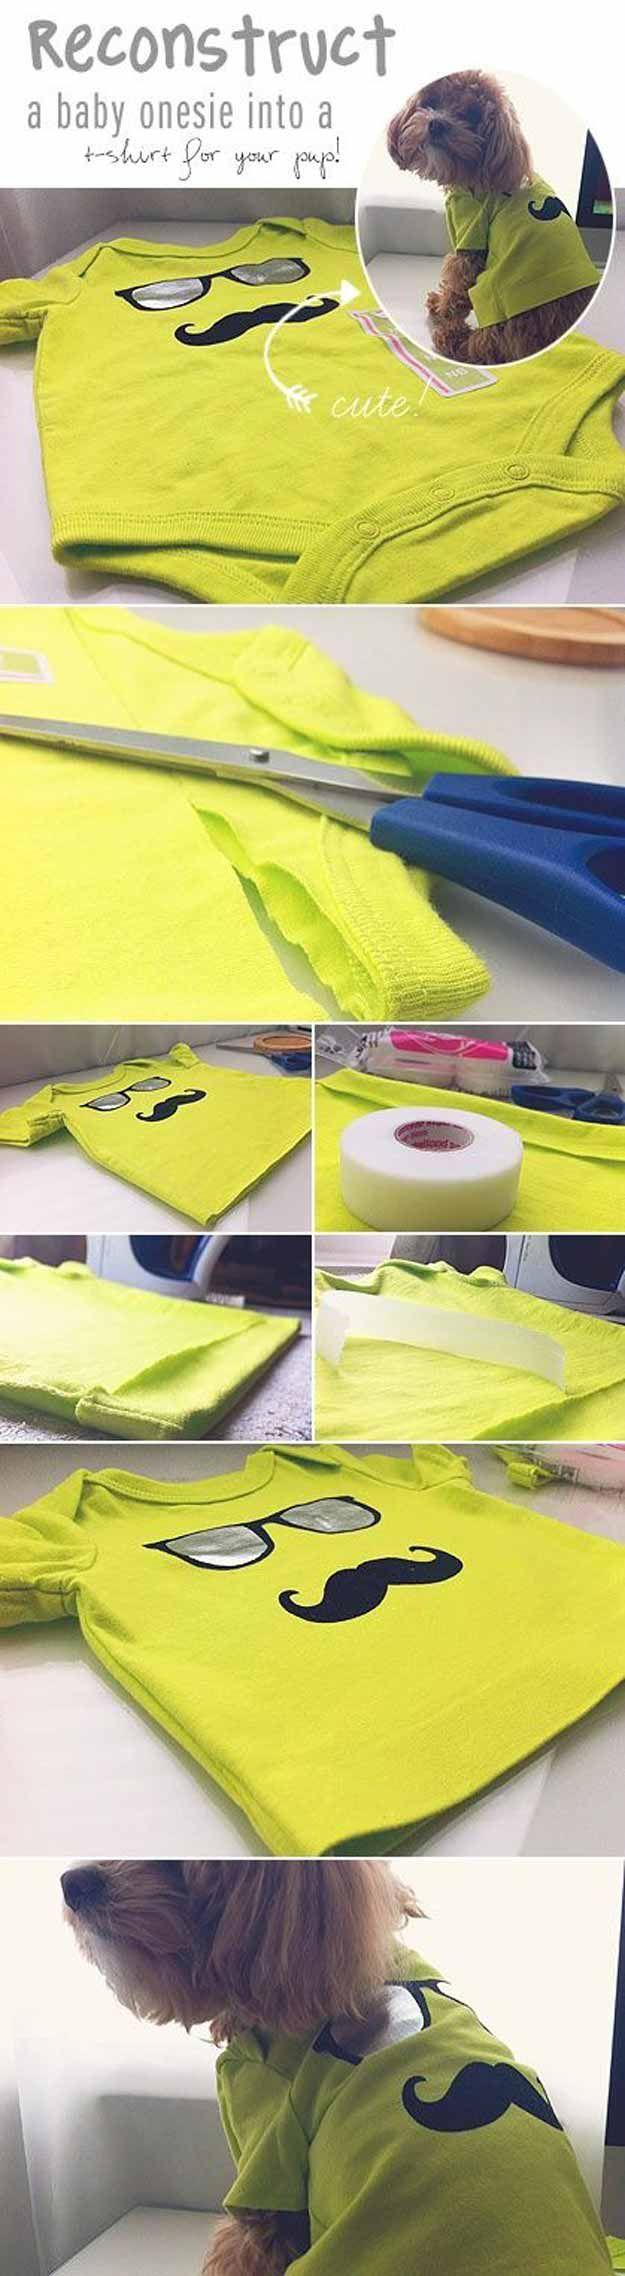 Check out 12 DIY Dog Clothes and Coats | Baby Onesie to Dog Shirt by DIY Ready at diyready.com/...                                                                                                                                                                                 Más